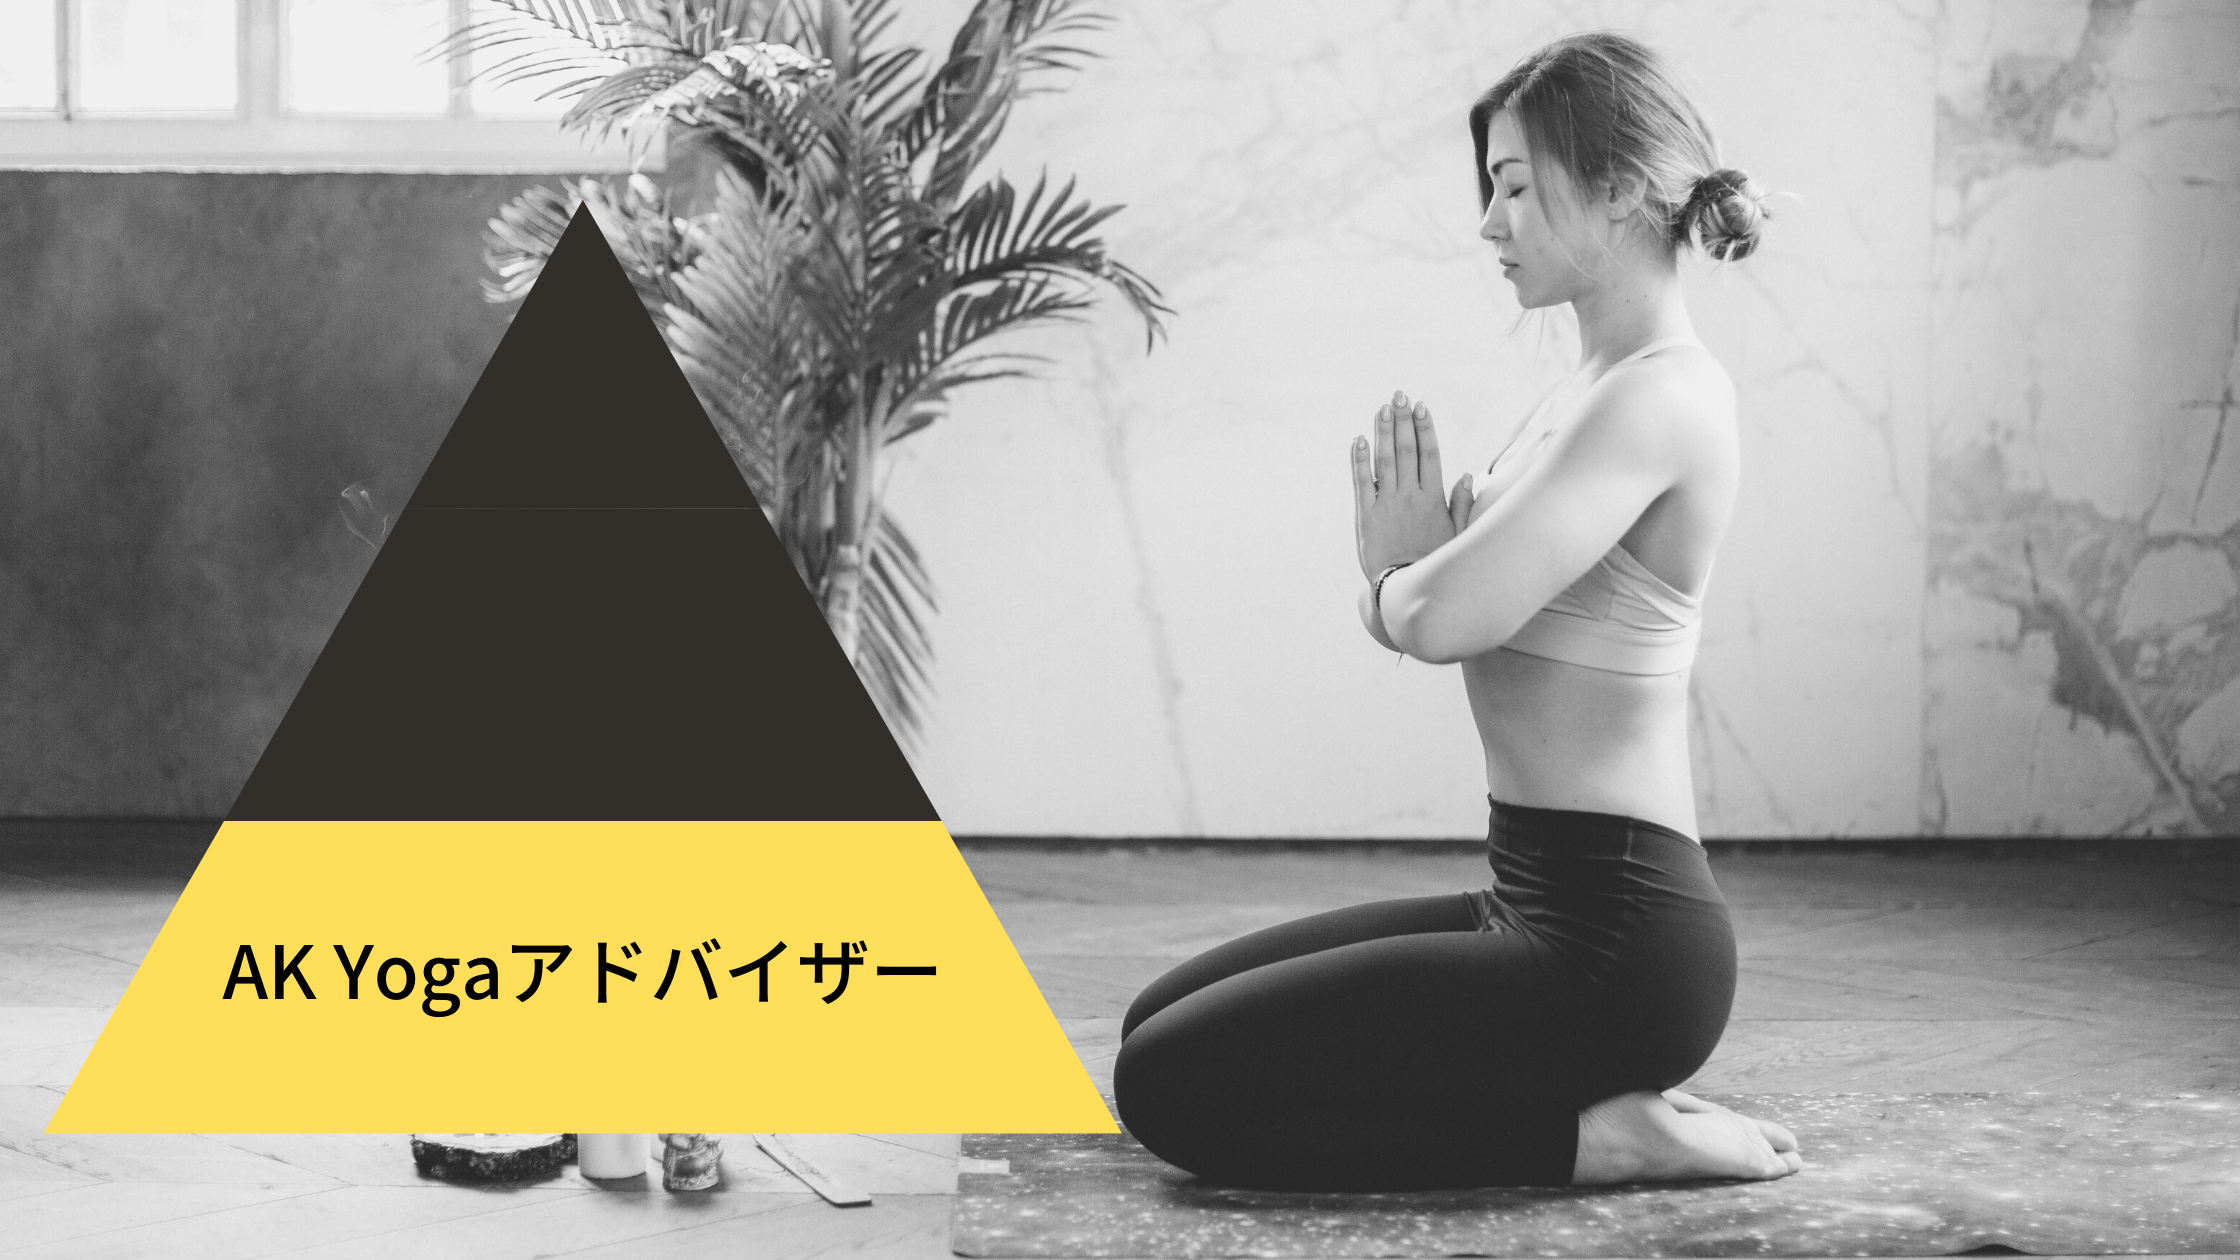 AK Yoga Advisor Course image